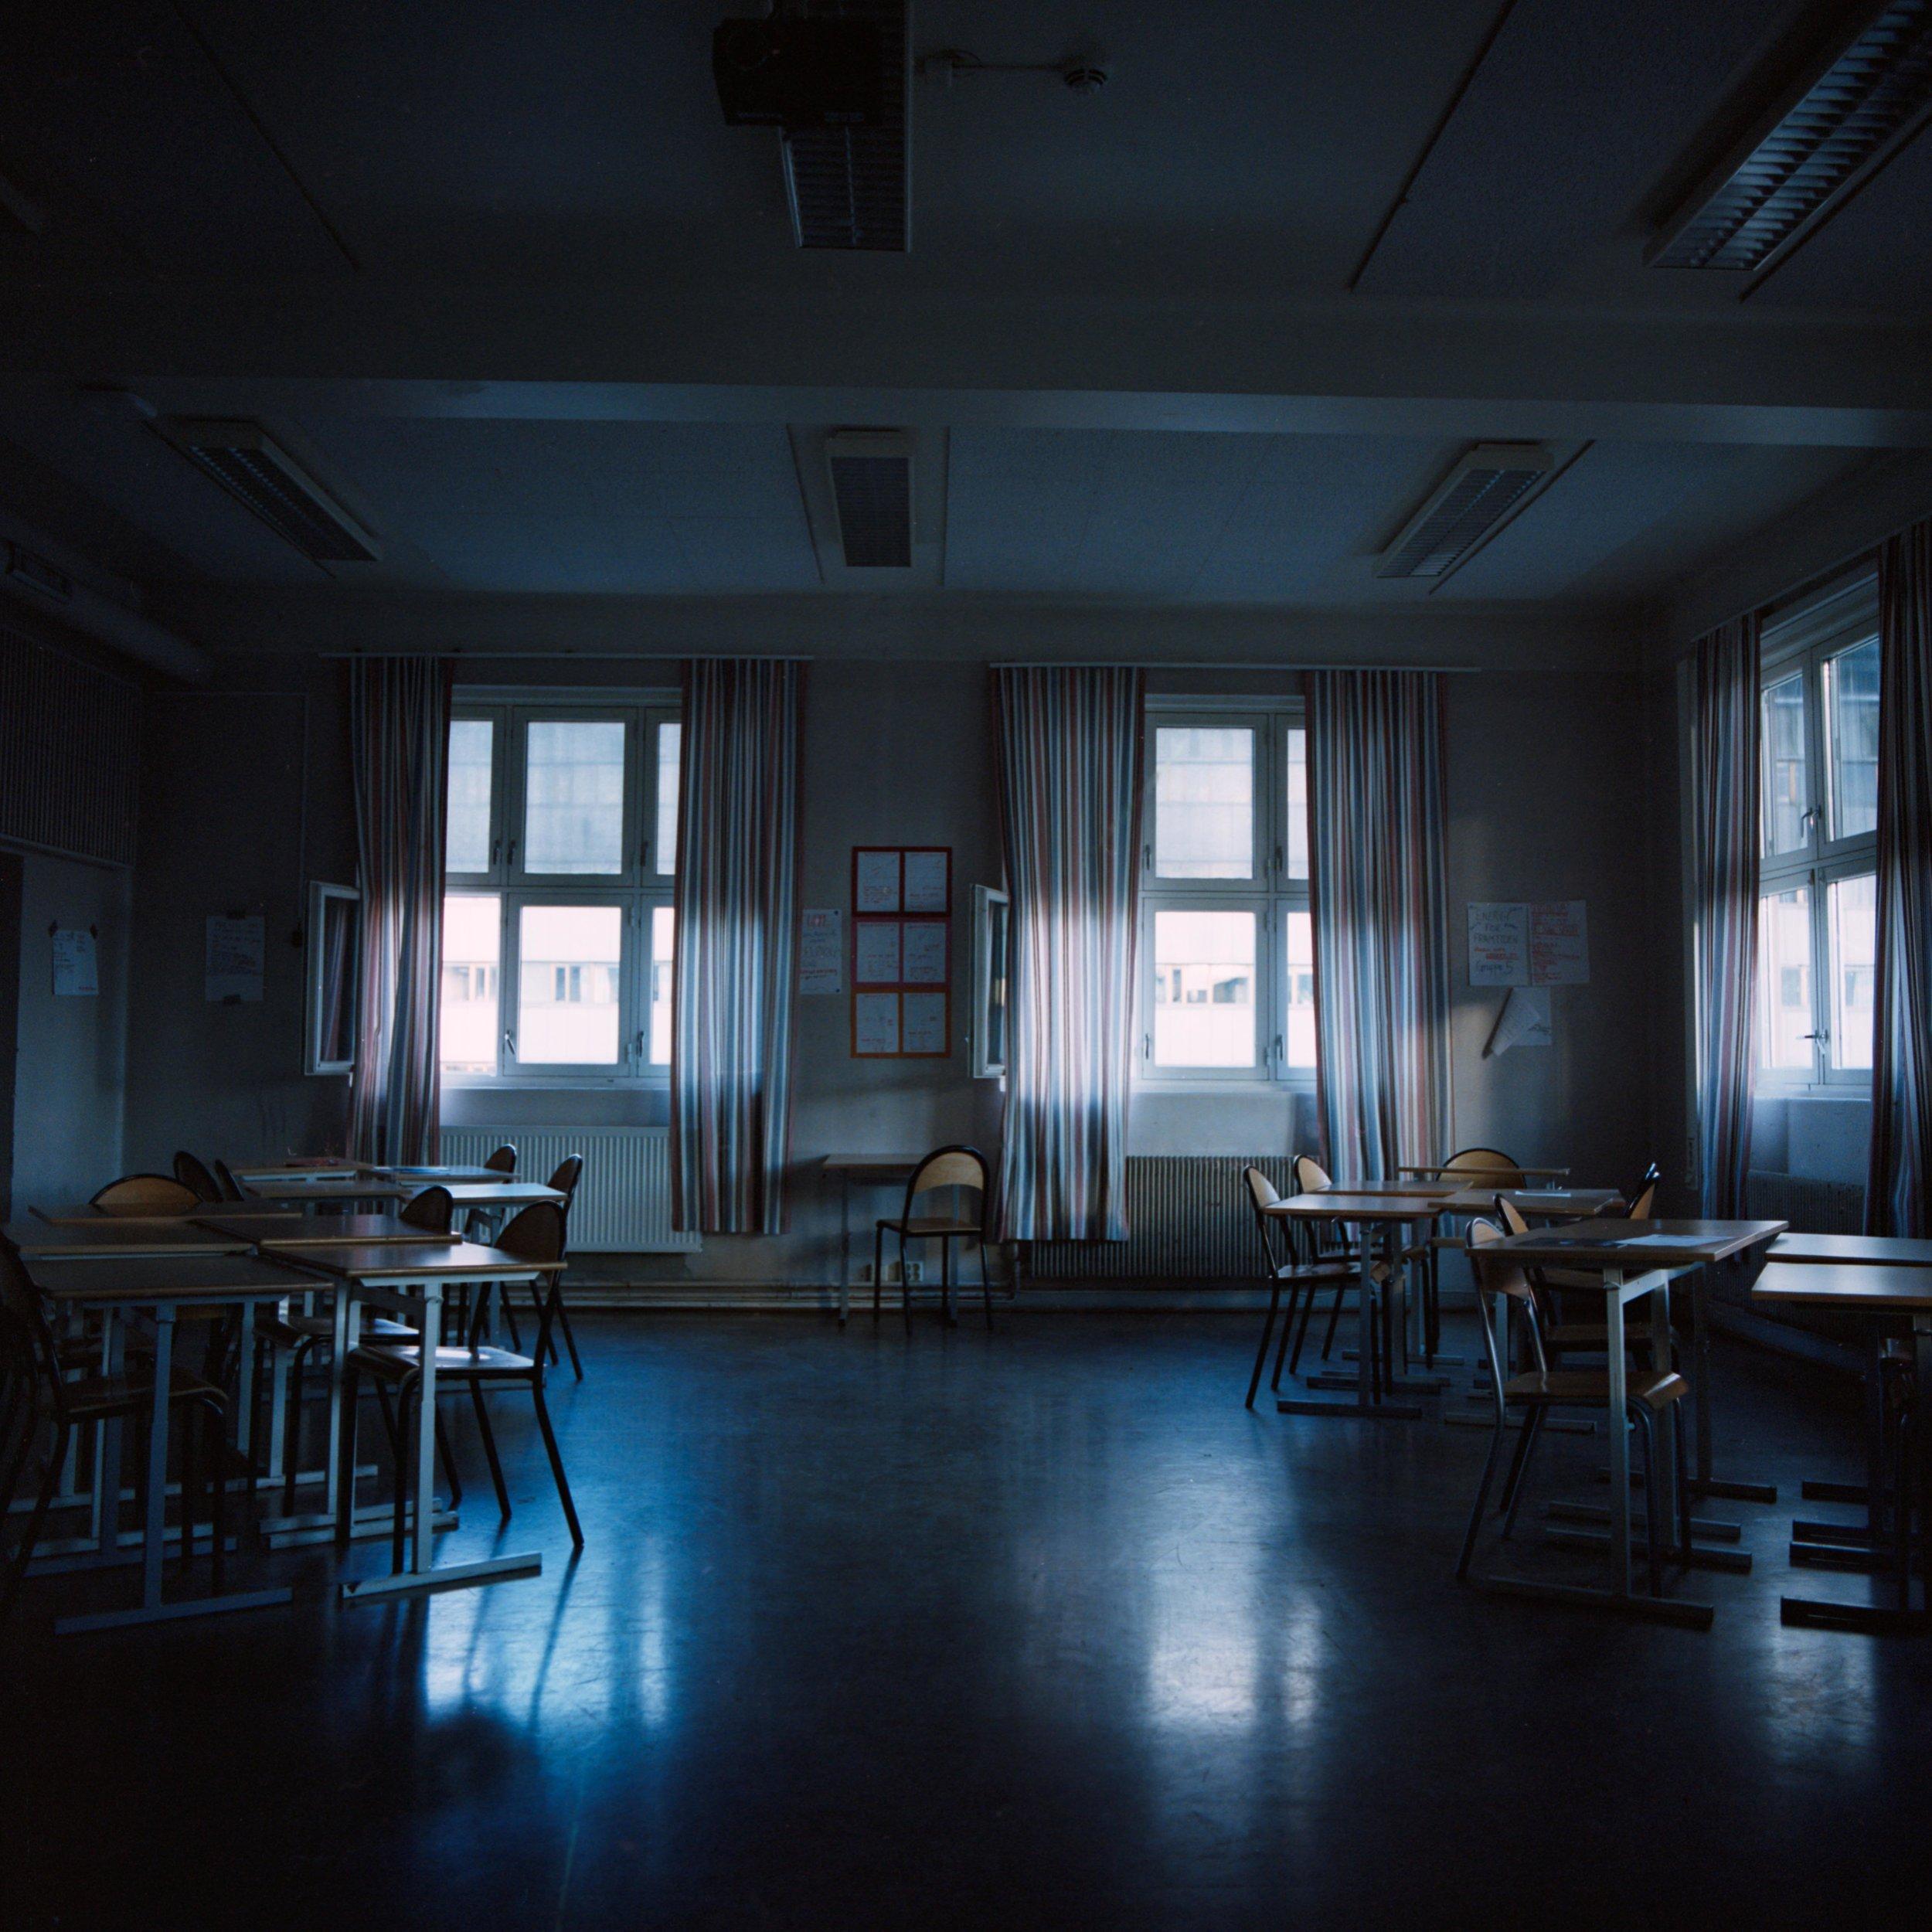 Classrooms2.jpg